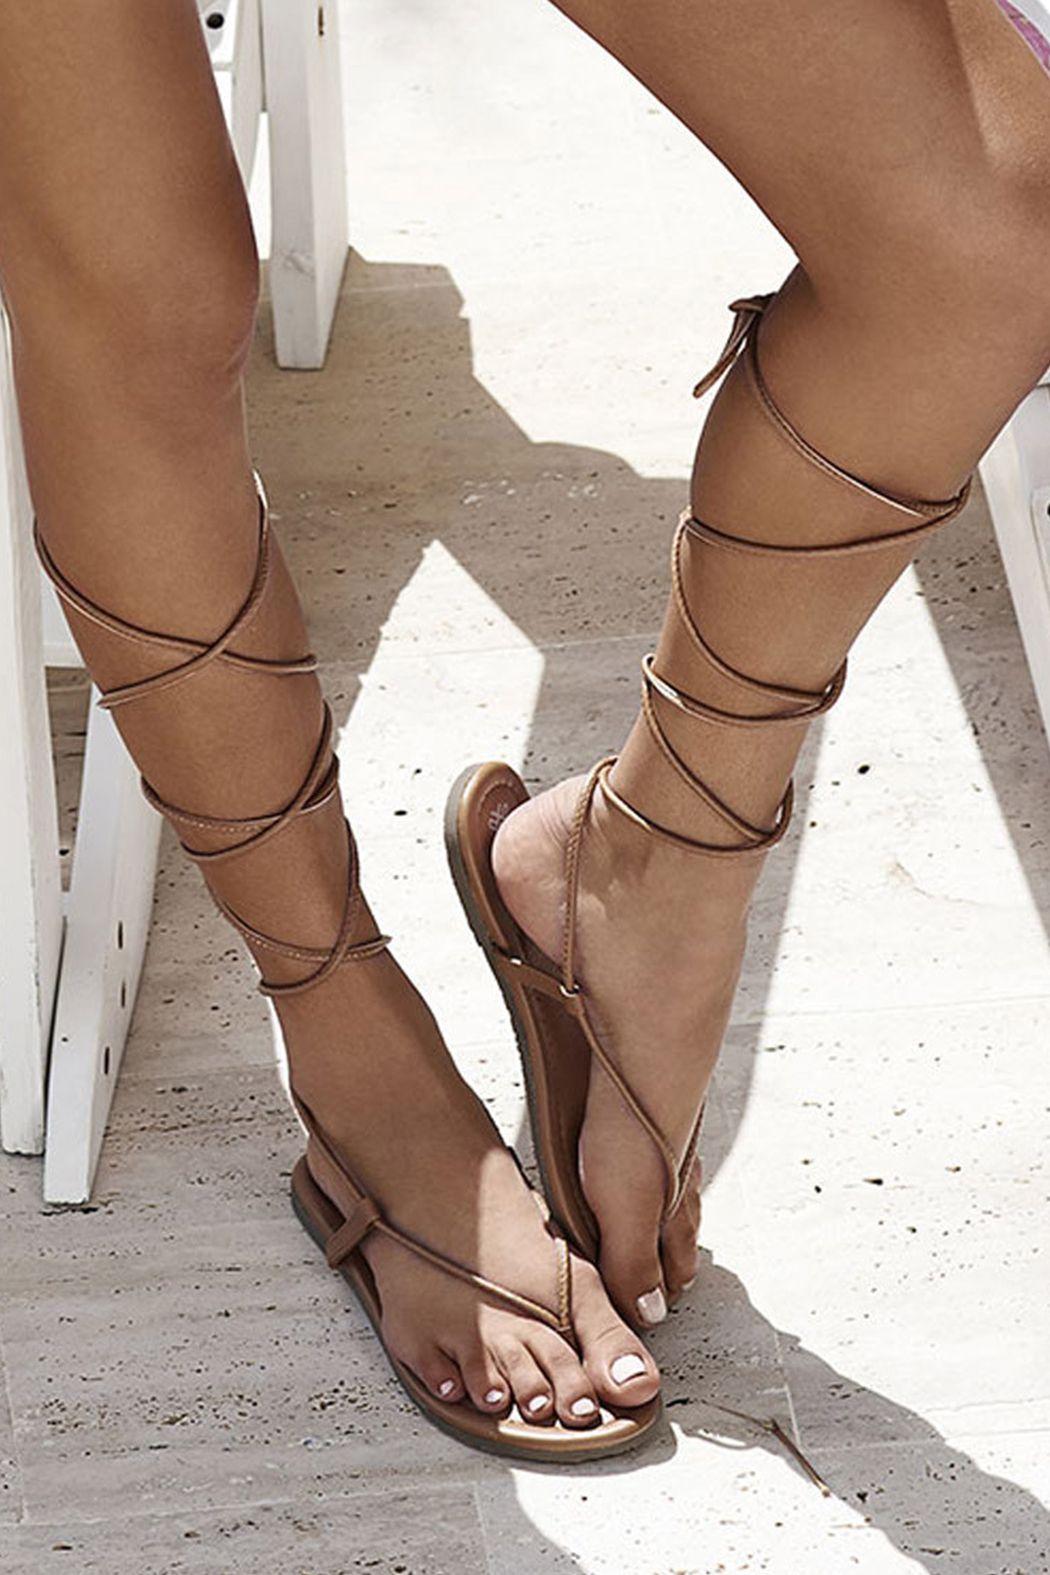 b62f19c2bd336 Tan Gladiator Sandal - Flat sandal. Long strings wrap around the legs and  tie just below the knee. Boutique Mango Molli Swimwear